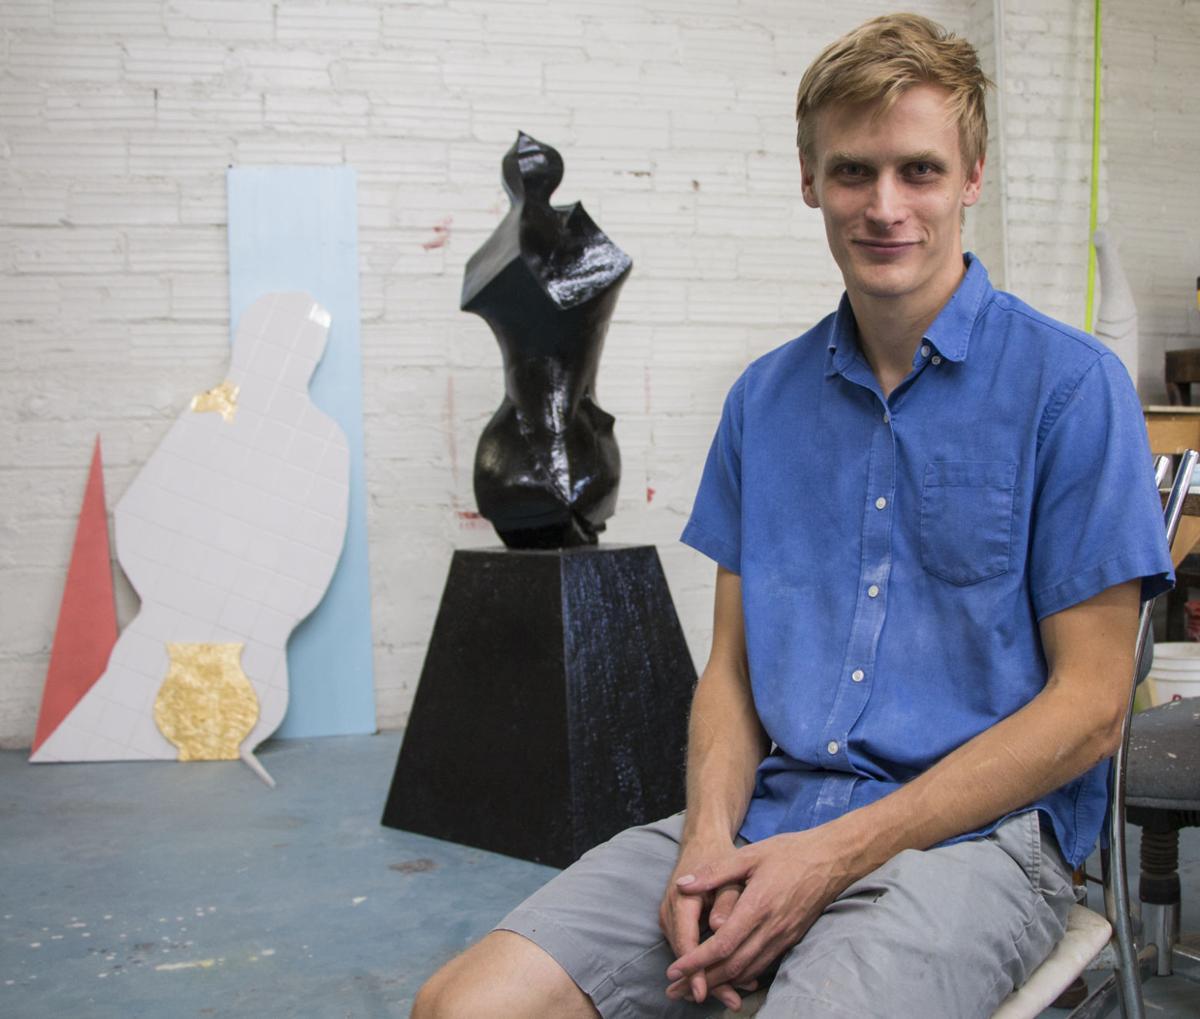 Nebraska Wesleyan Ceramics Teacher Molds The Minds Of